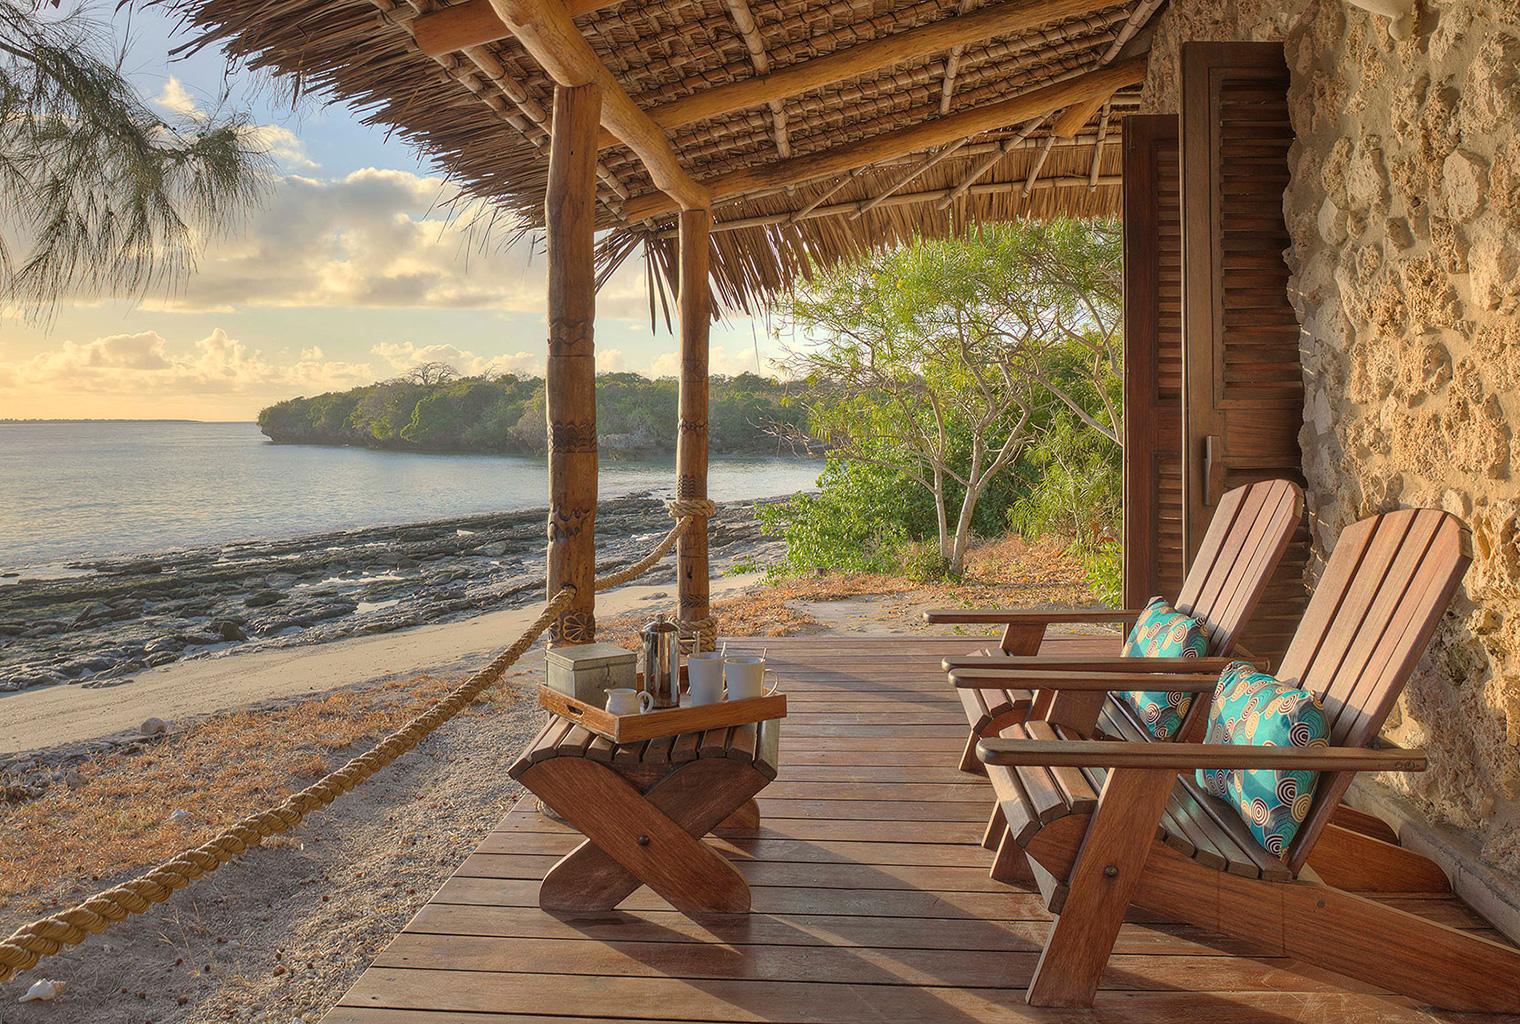 Azura-Quilalea-Mozambique-Deck-Views